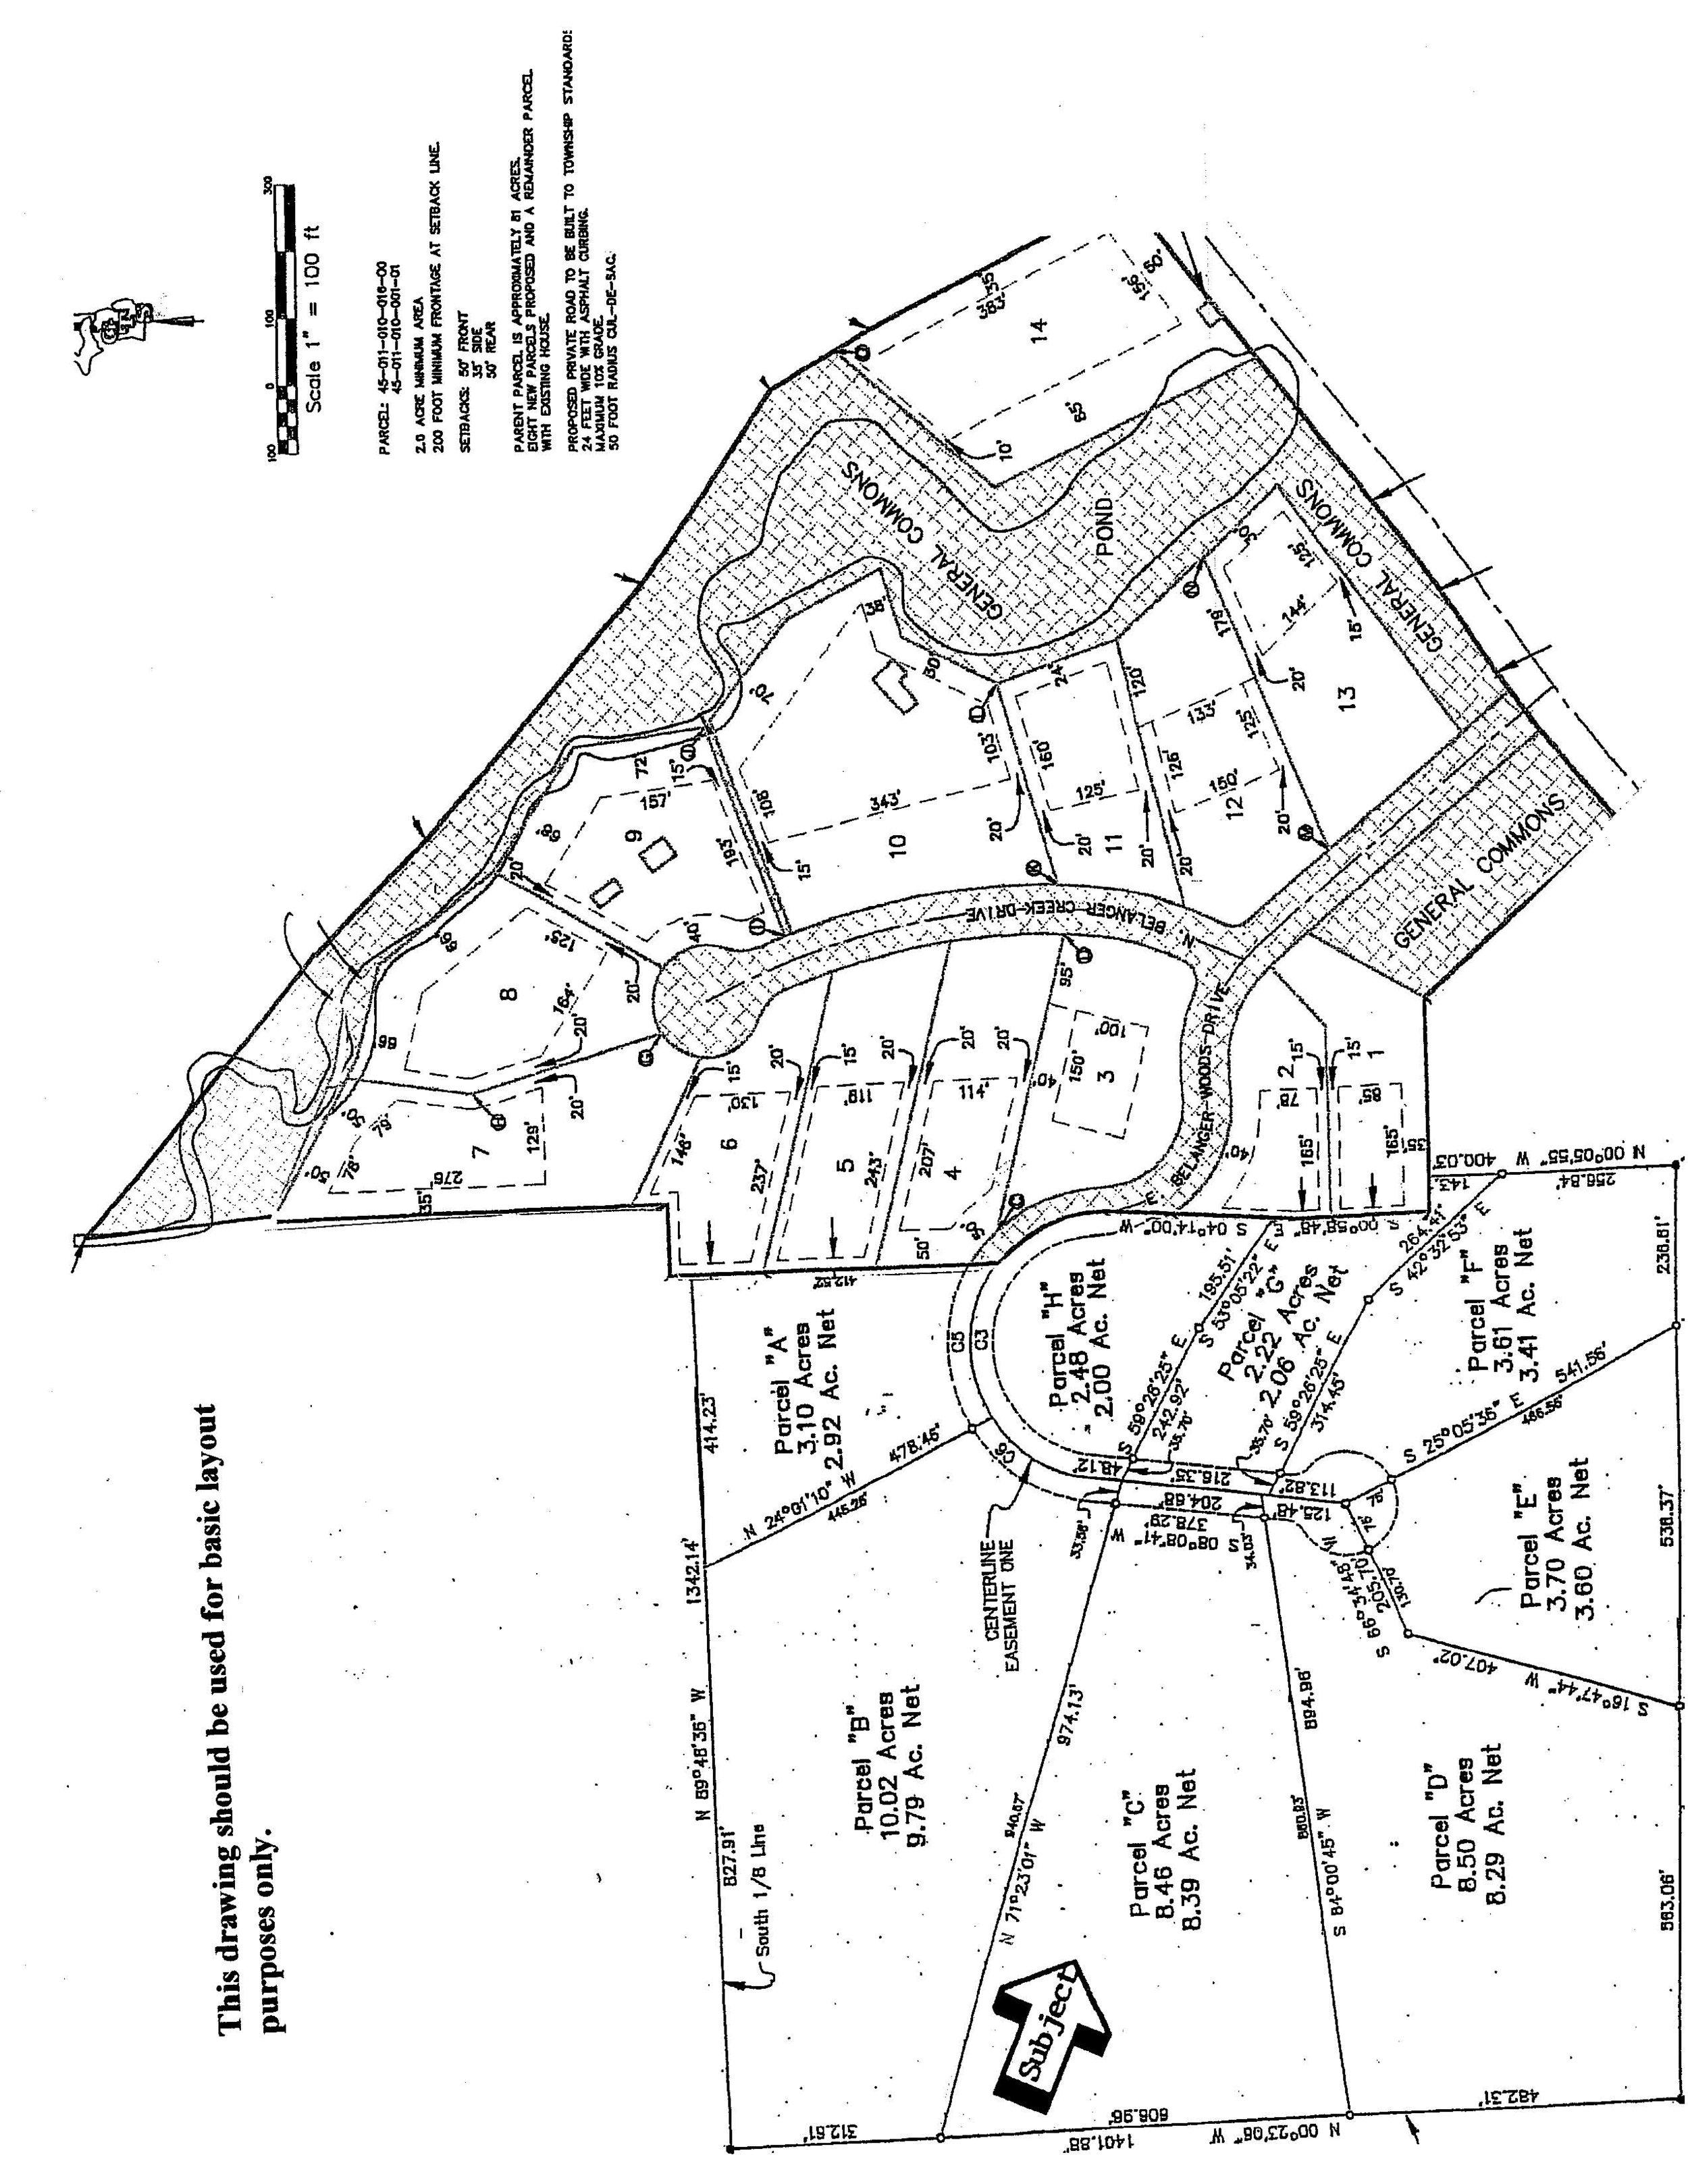 11635 E Belanger Woods Dr Marketing Packet - For Sale by Oltersdorf Realty LLC (8).jpg